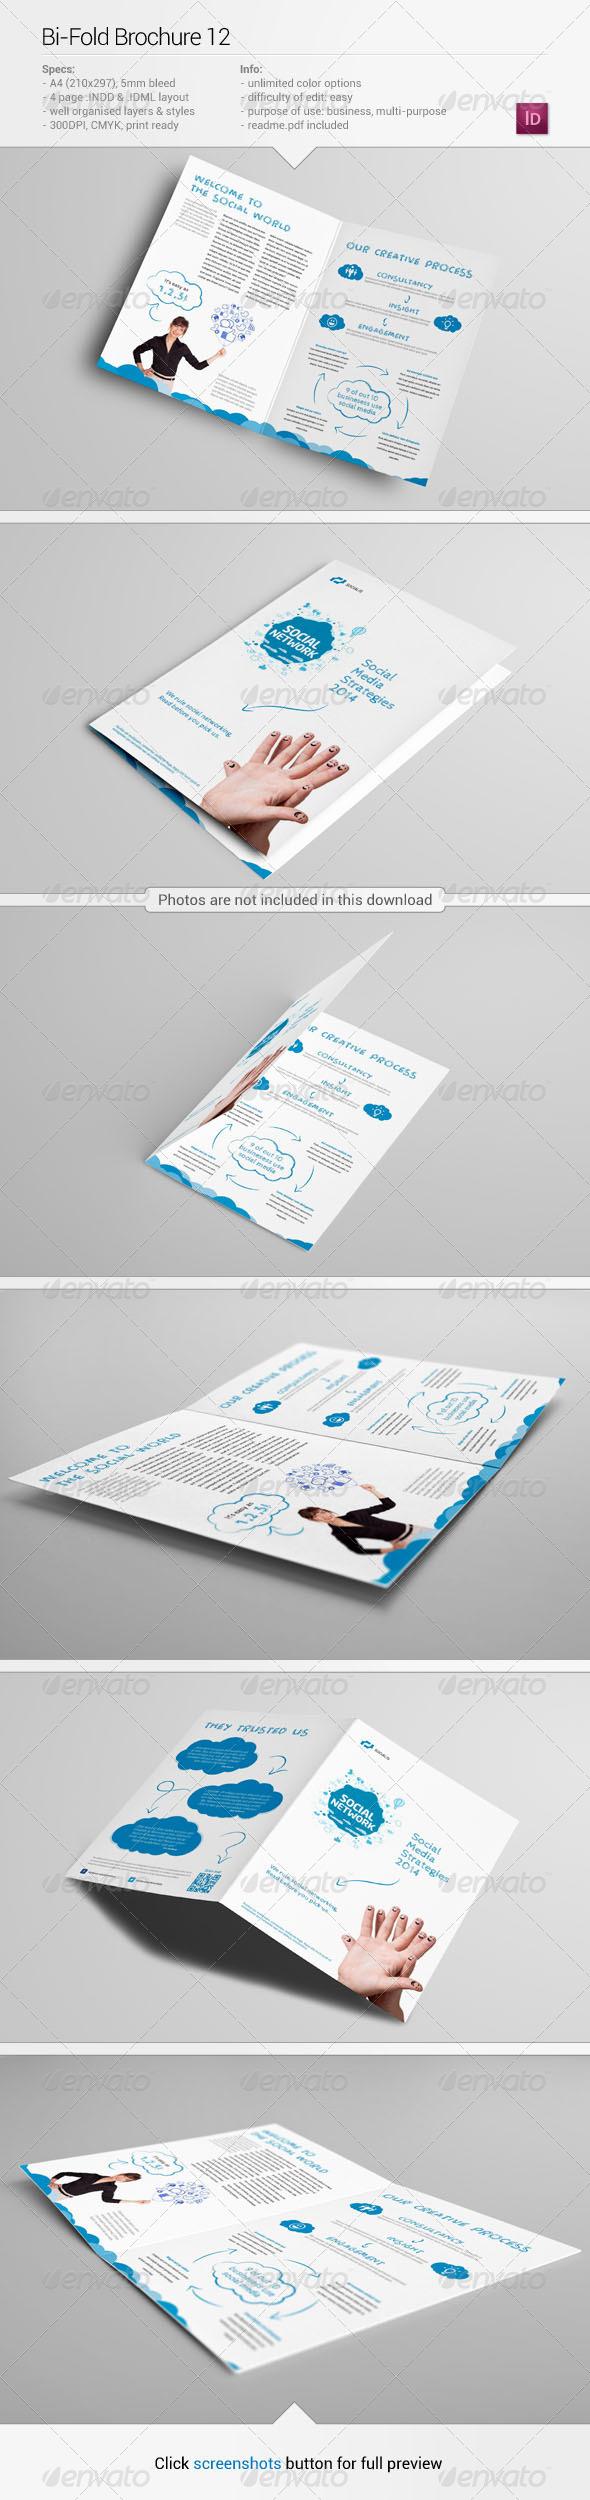 GraphicRiver Bi-Fold Brochure 12 5546606